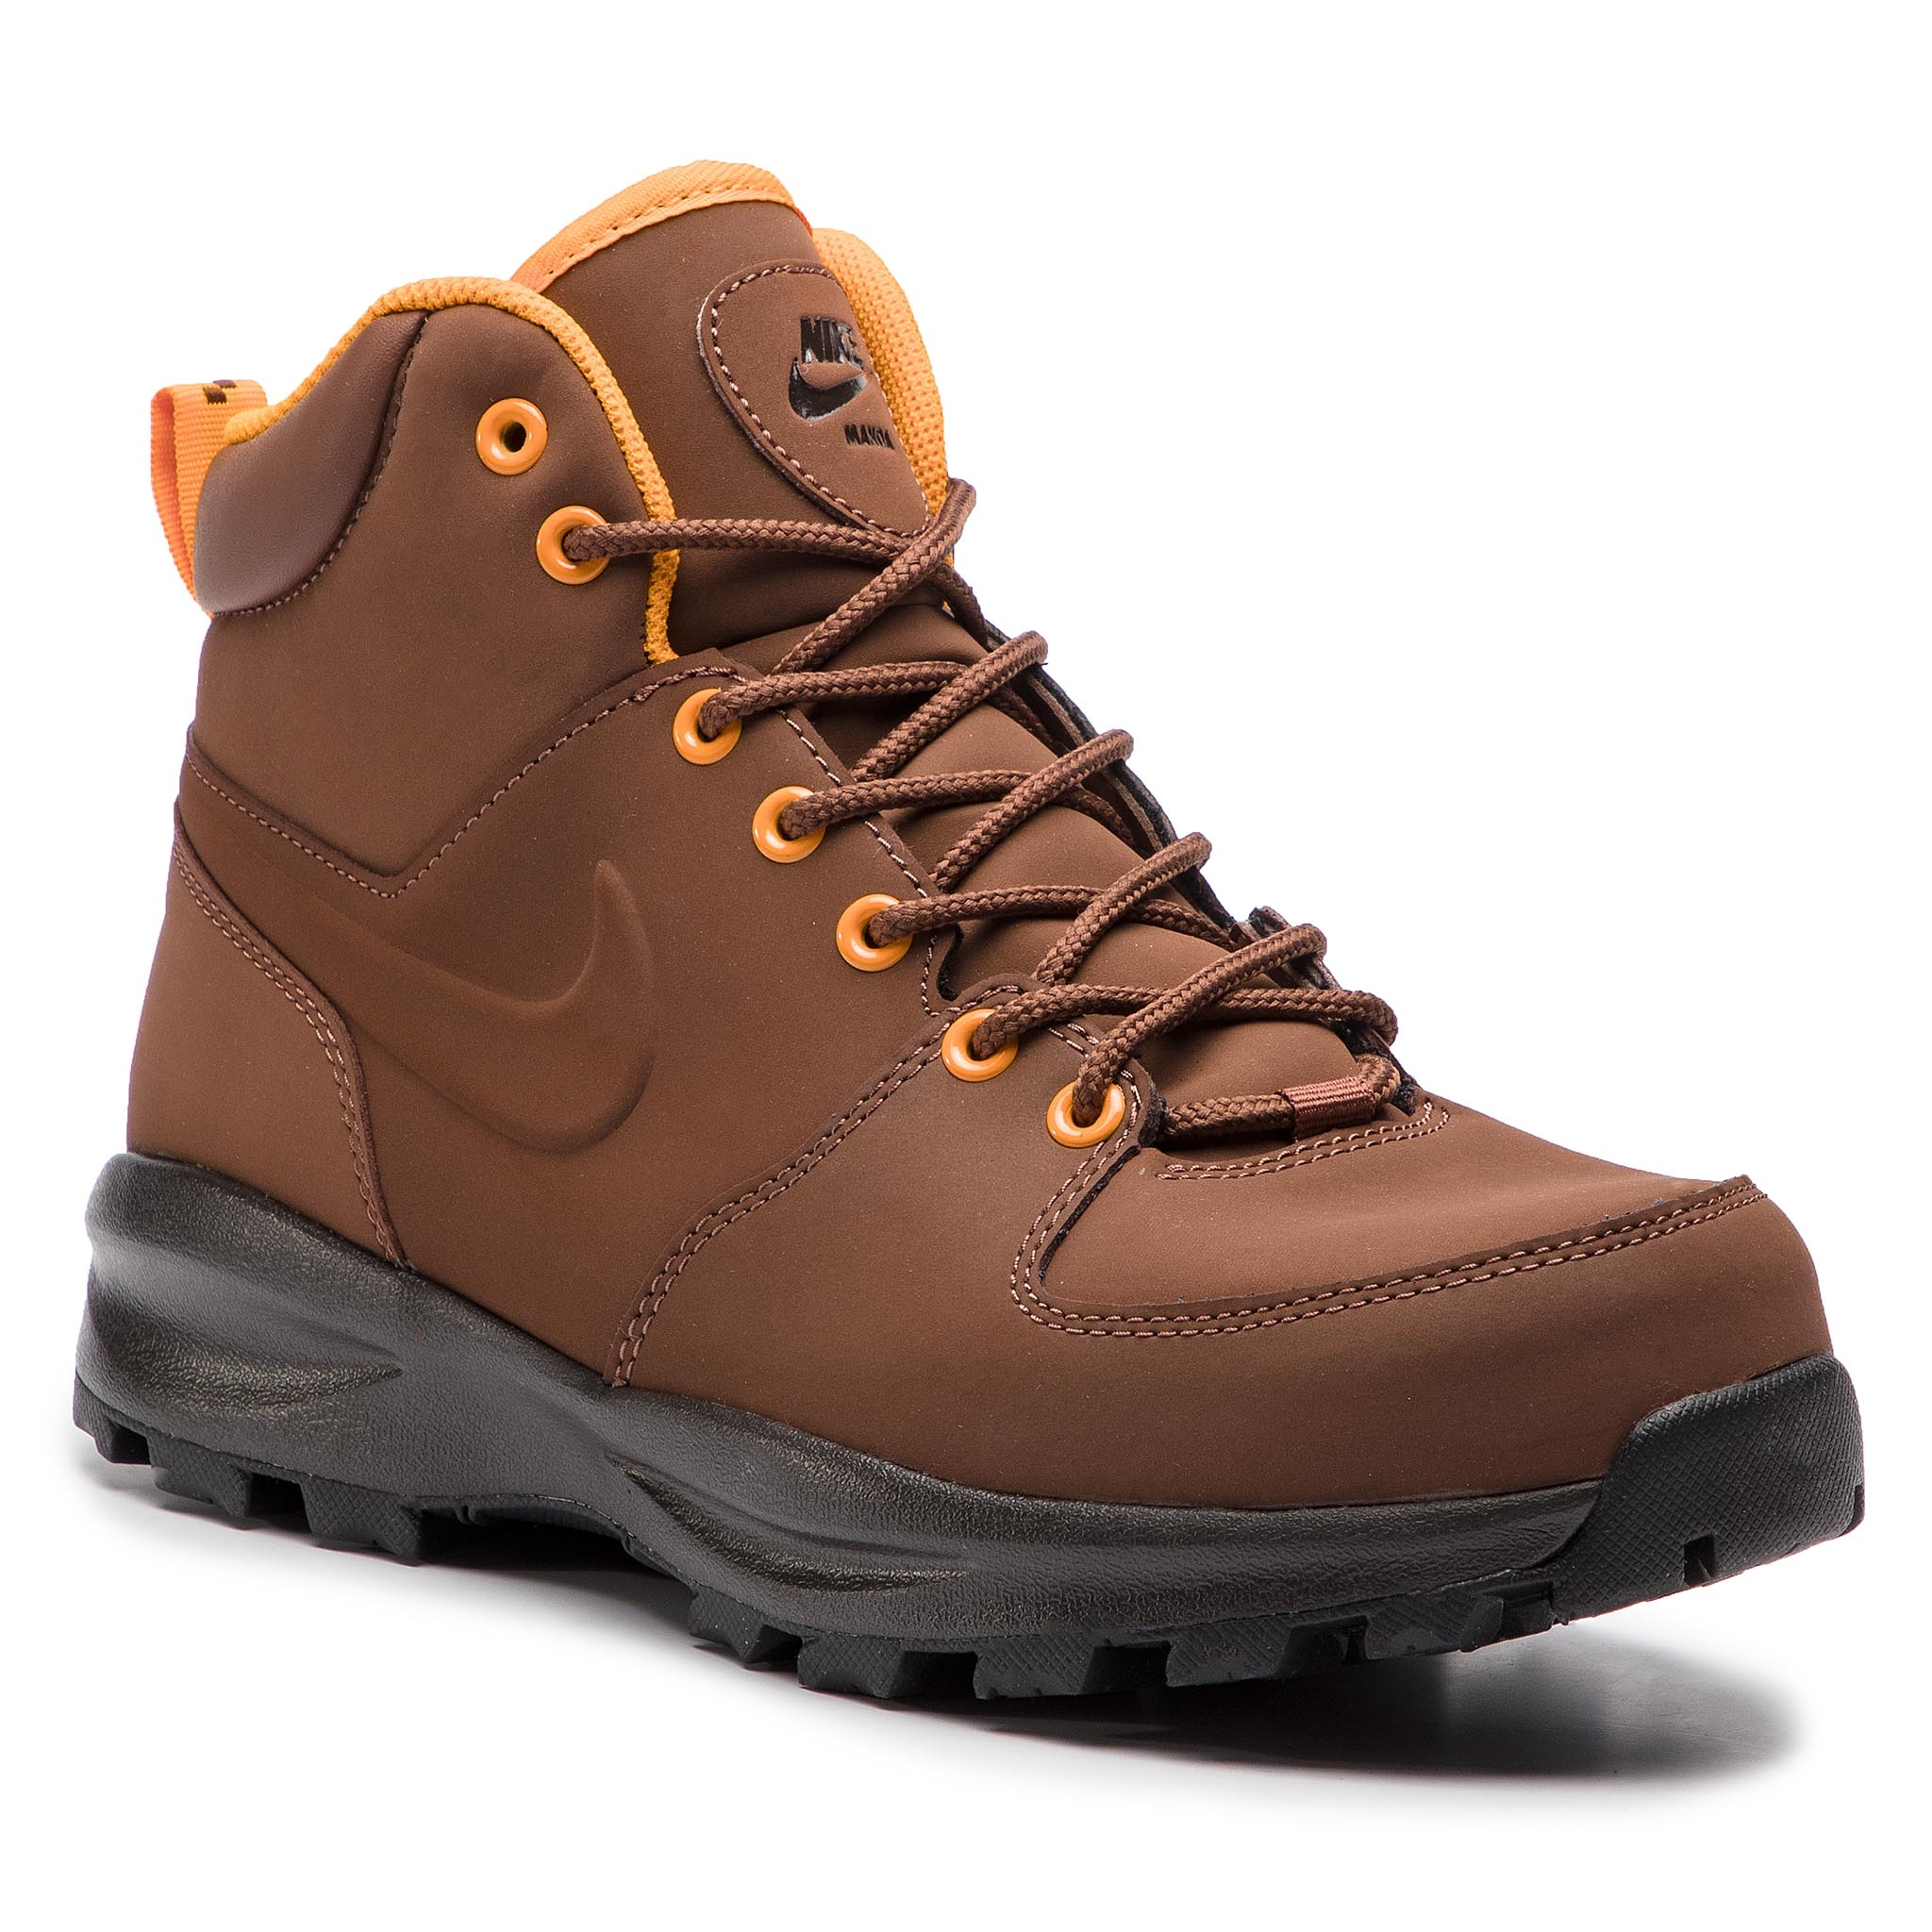 a42b431c0 Topánky NIKE - Manoa Leather 454350 203 Fauna Brown/Fauna Brown ...